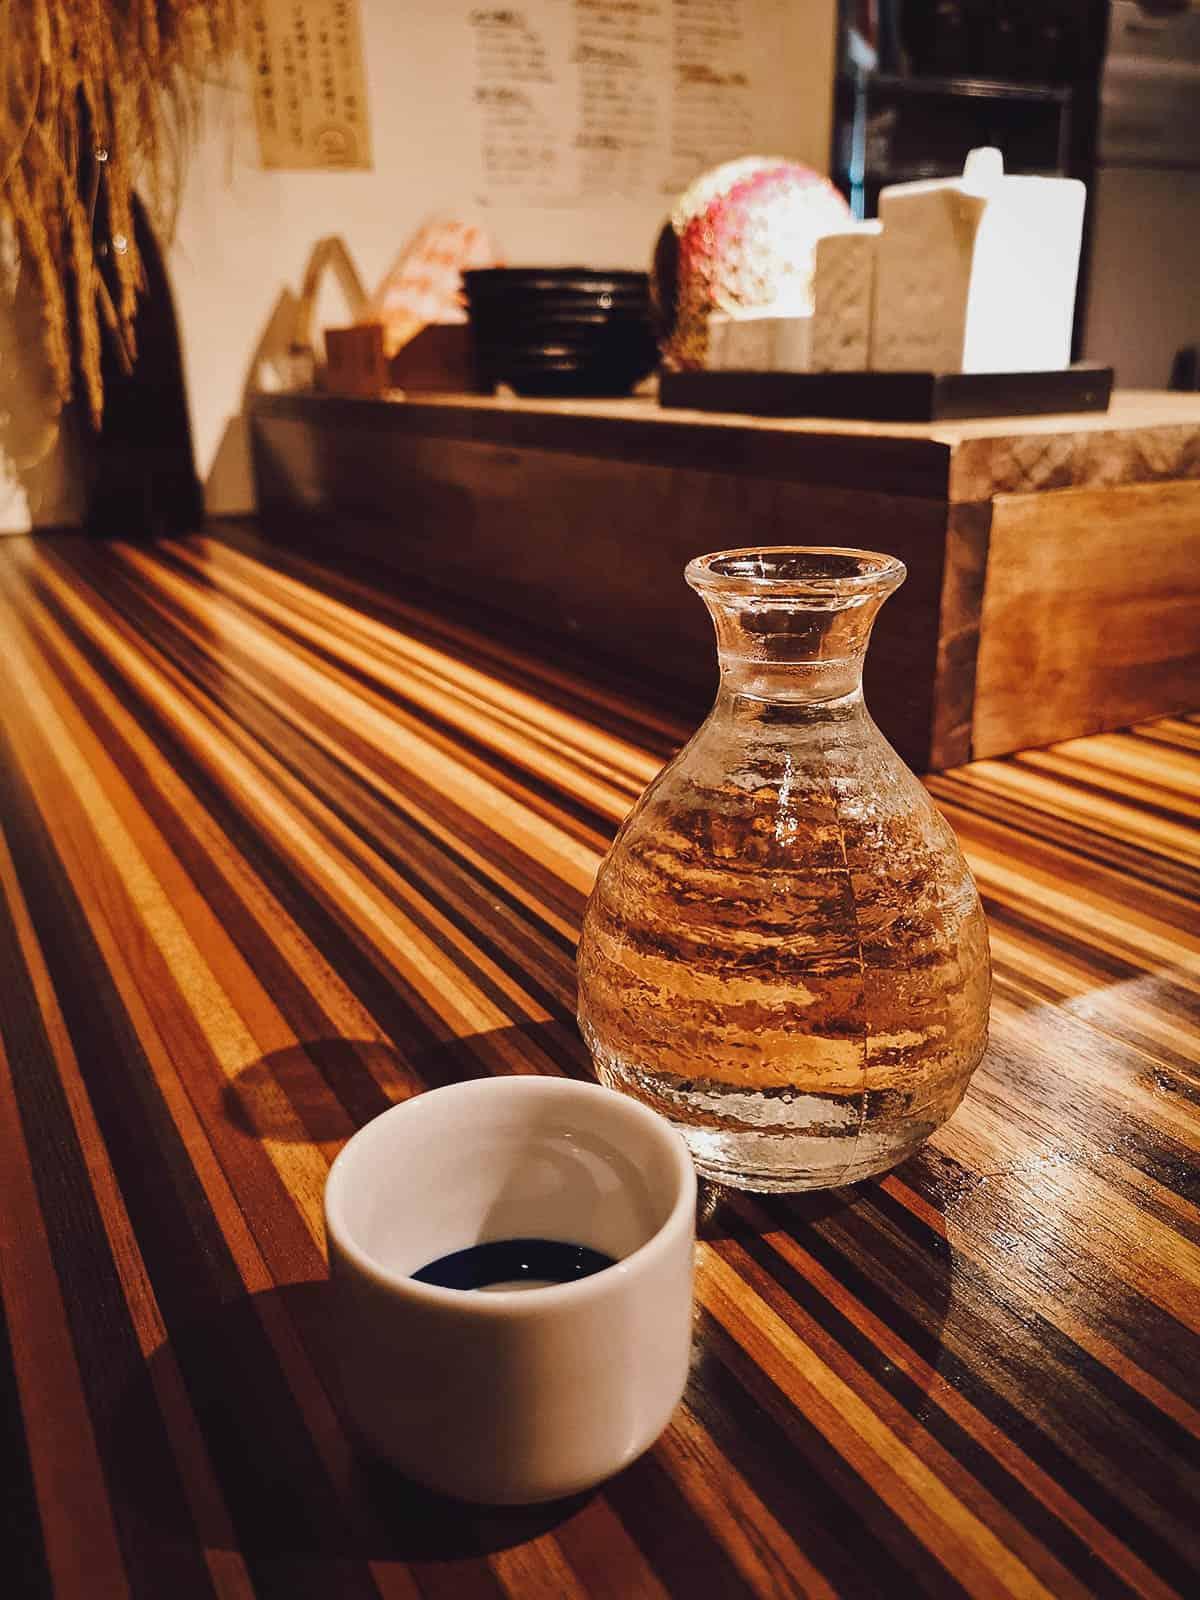 Vial of sake